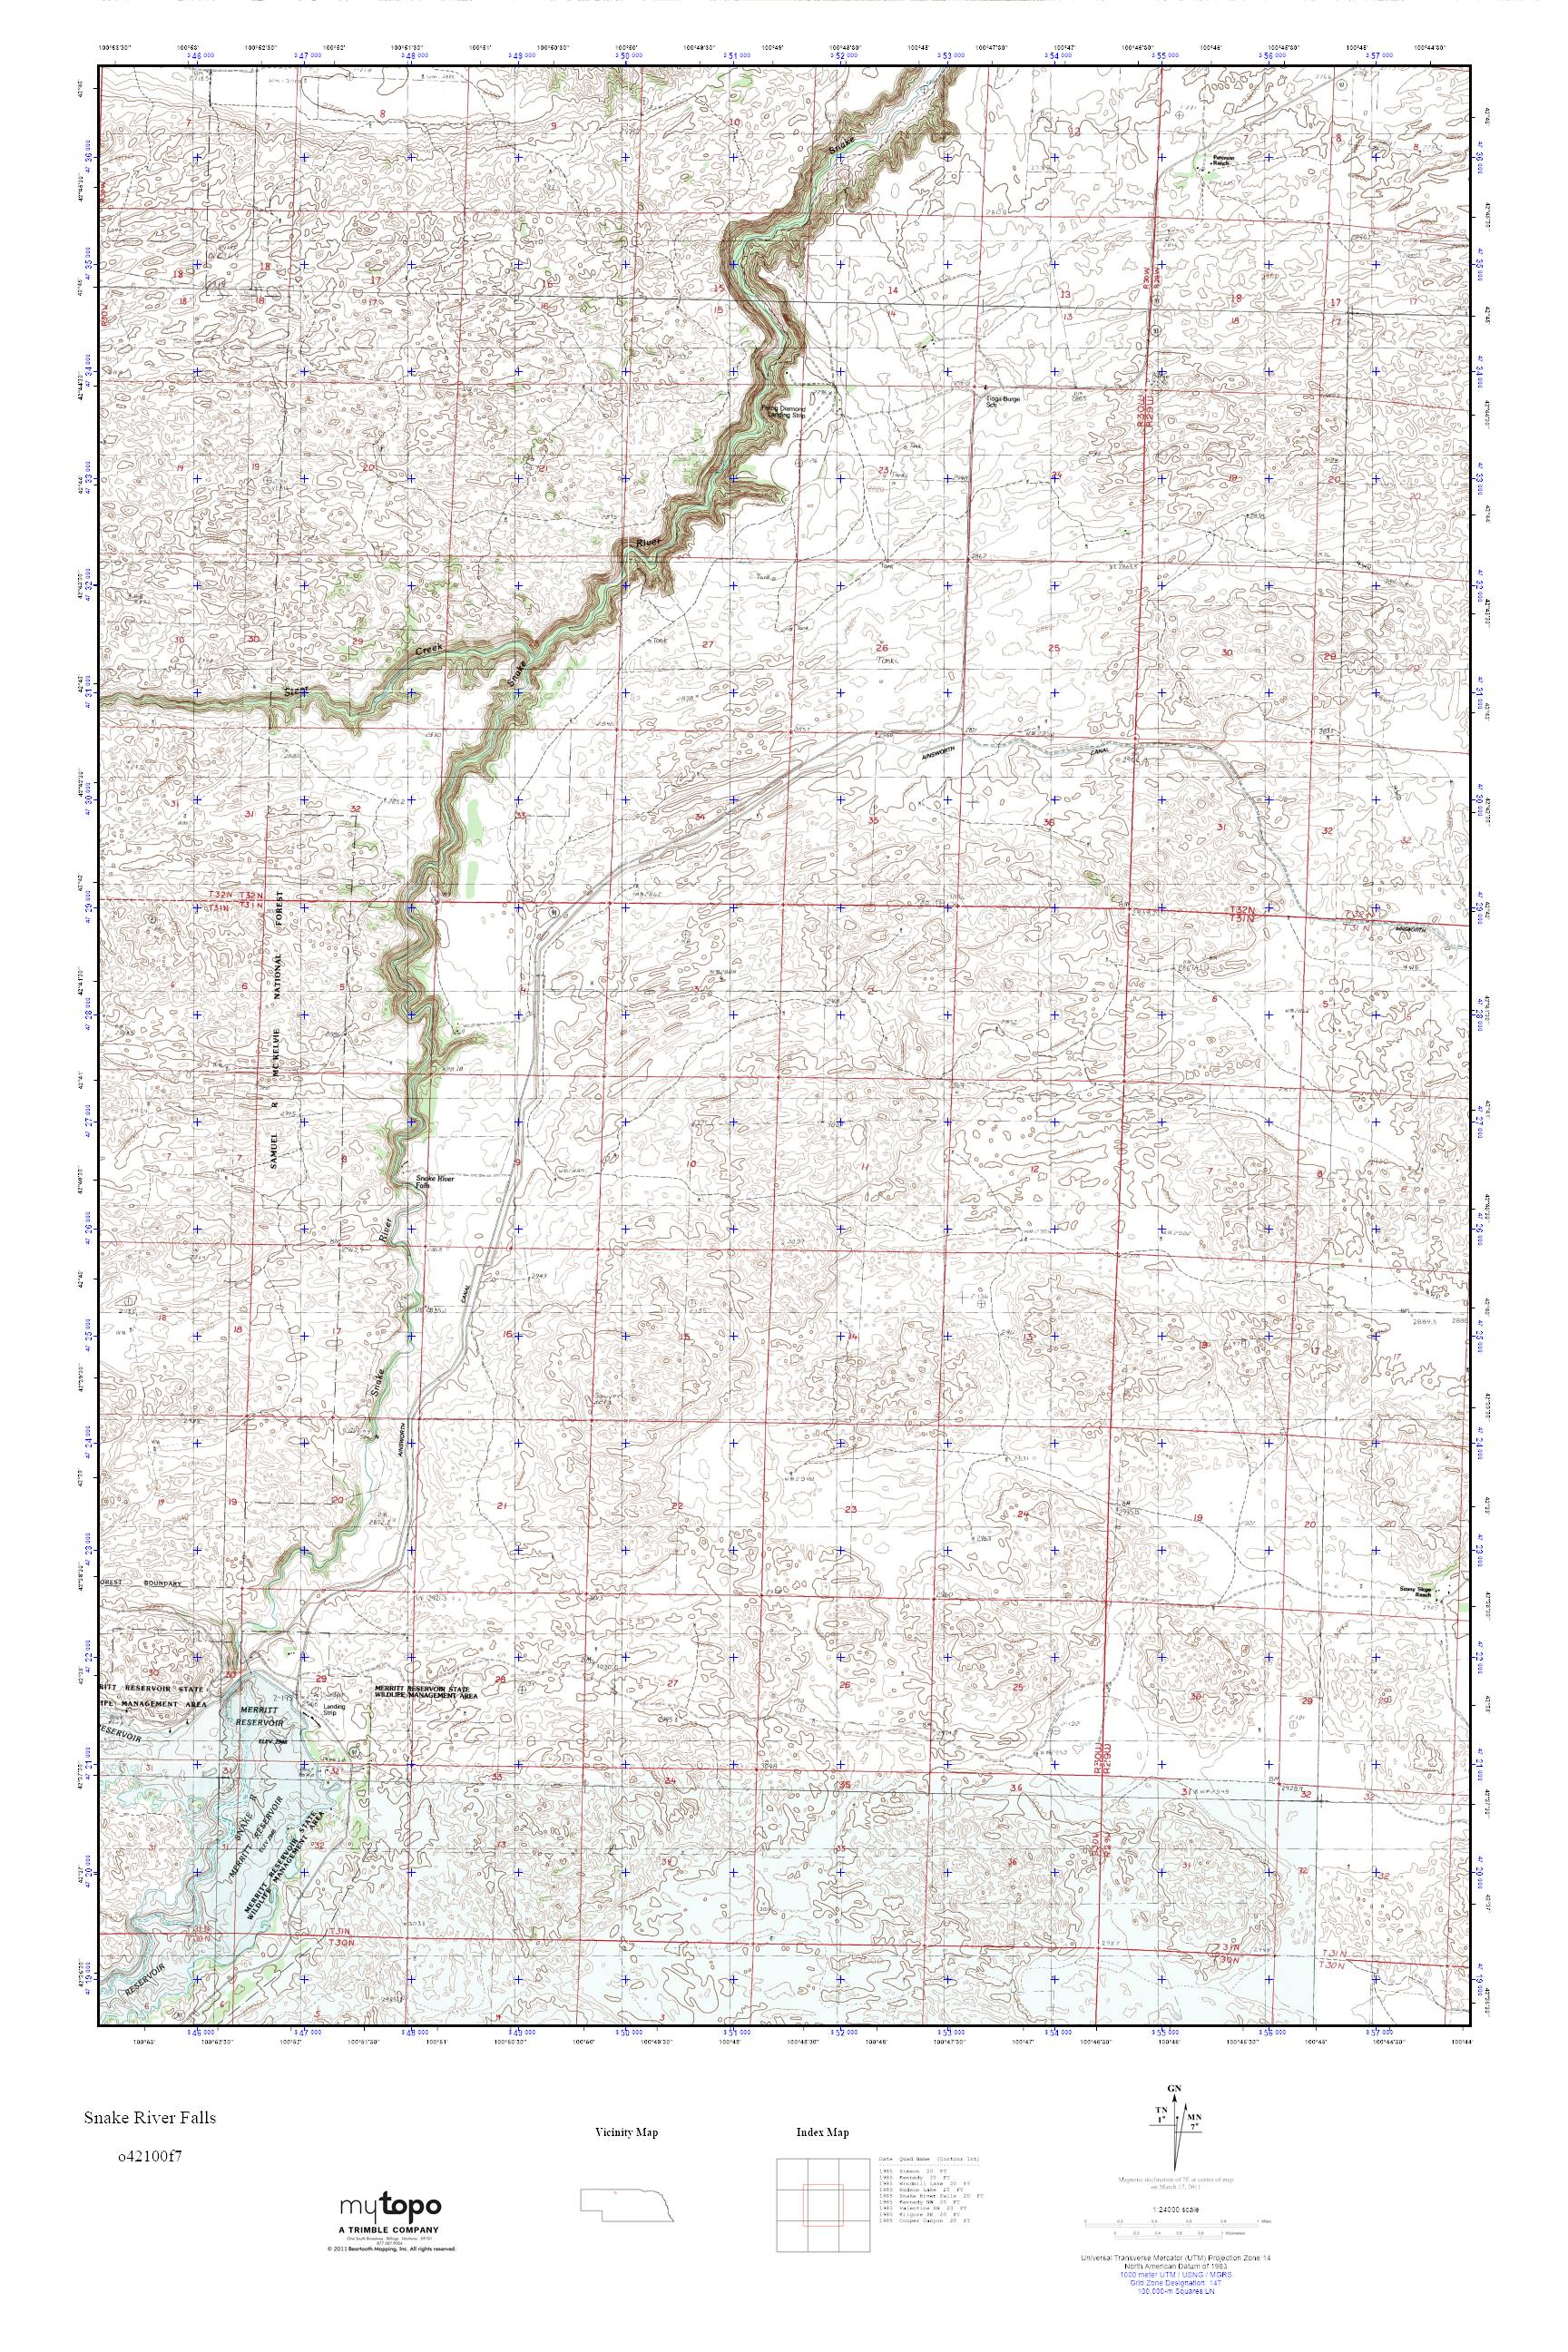 Snake River On Us Map - Us-map-snake-river